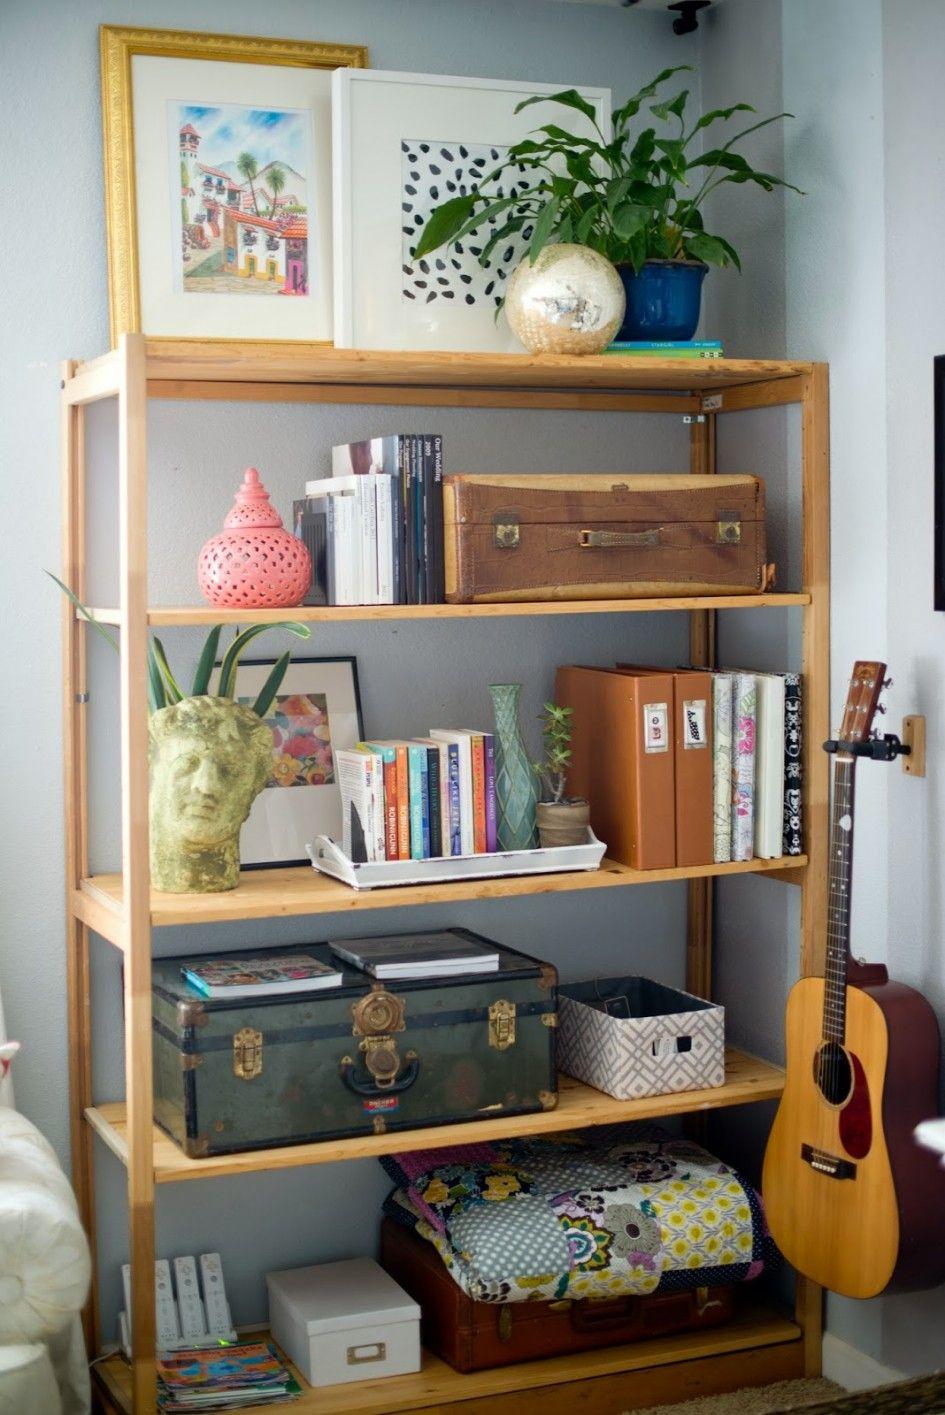 Interior Simplistic Oak Unfinished Living Room Shelves 4 Tier Open Rack Design With Calssic Guitar Inside Living Room Shelves Shelving Units Living Room Decor #shelves #design #in #living #room